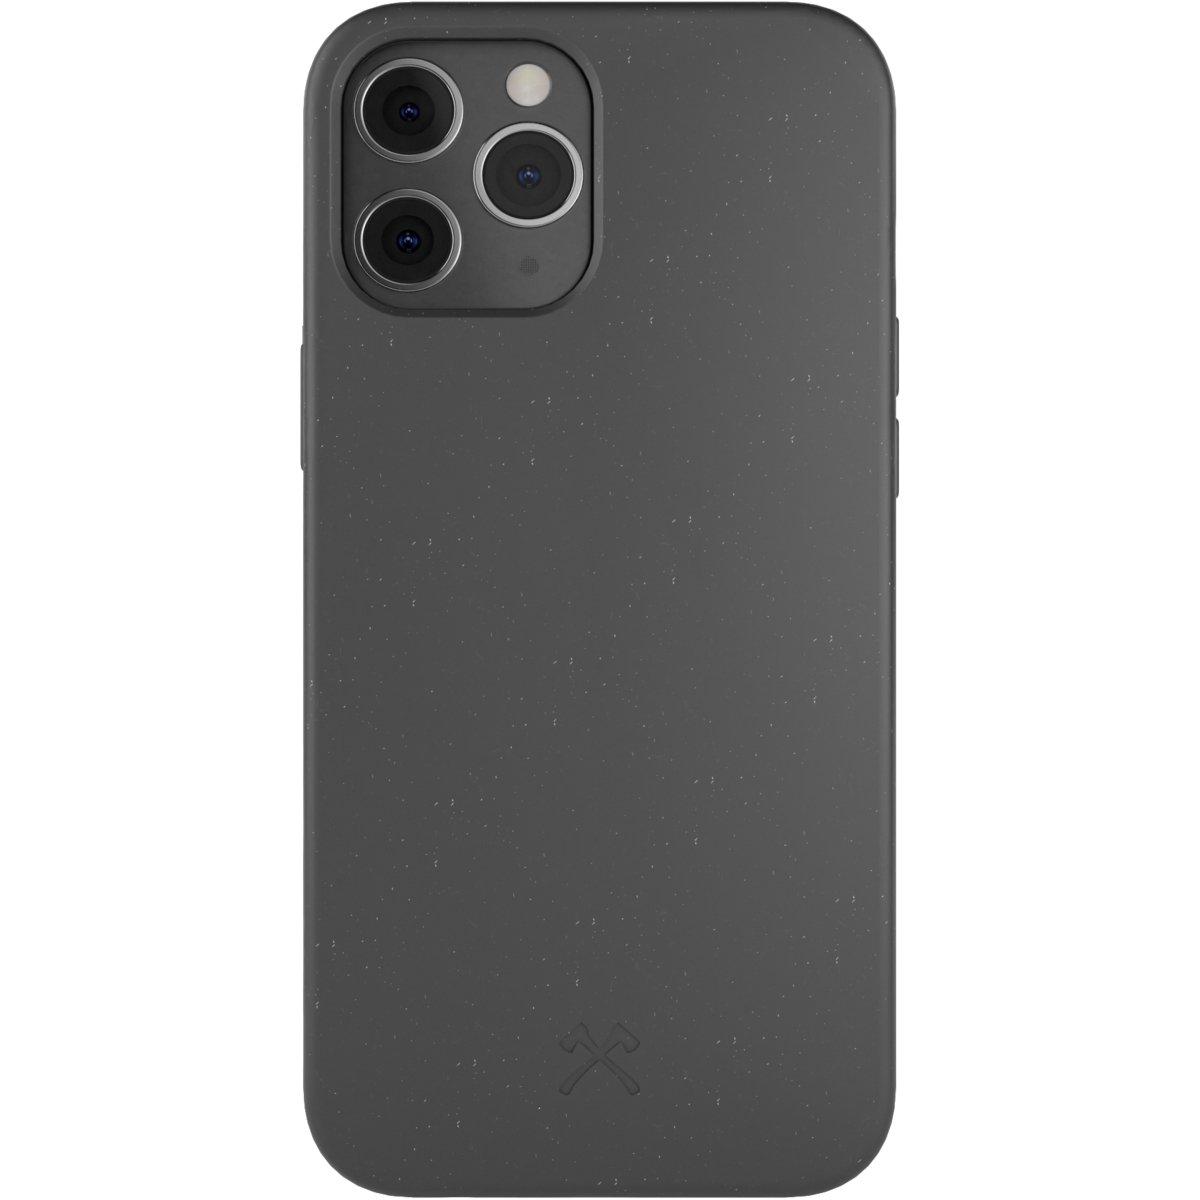 Woodcessories Bio Case AM iPhone 12 Pro Max - black